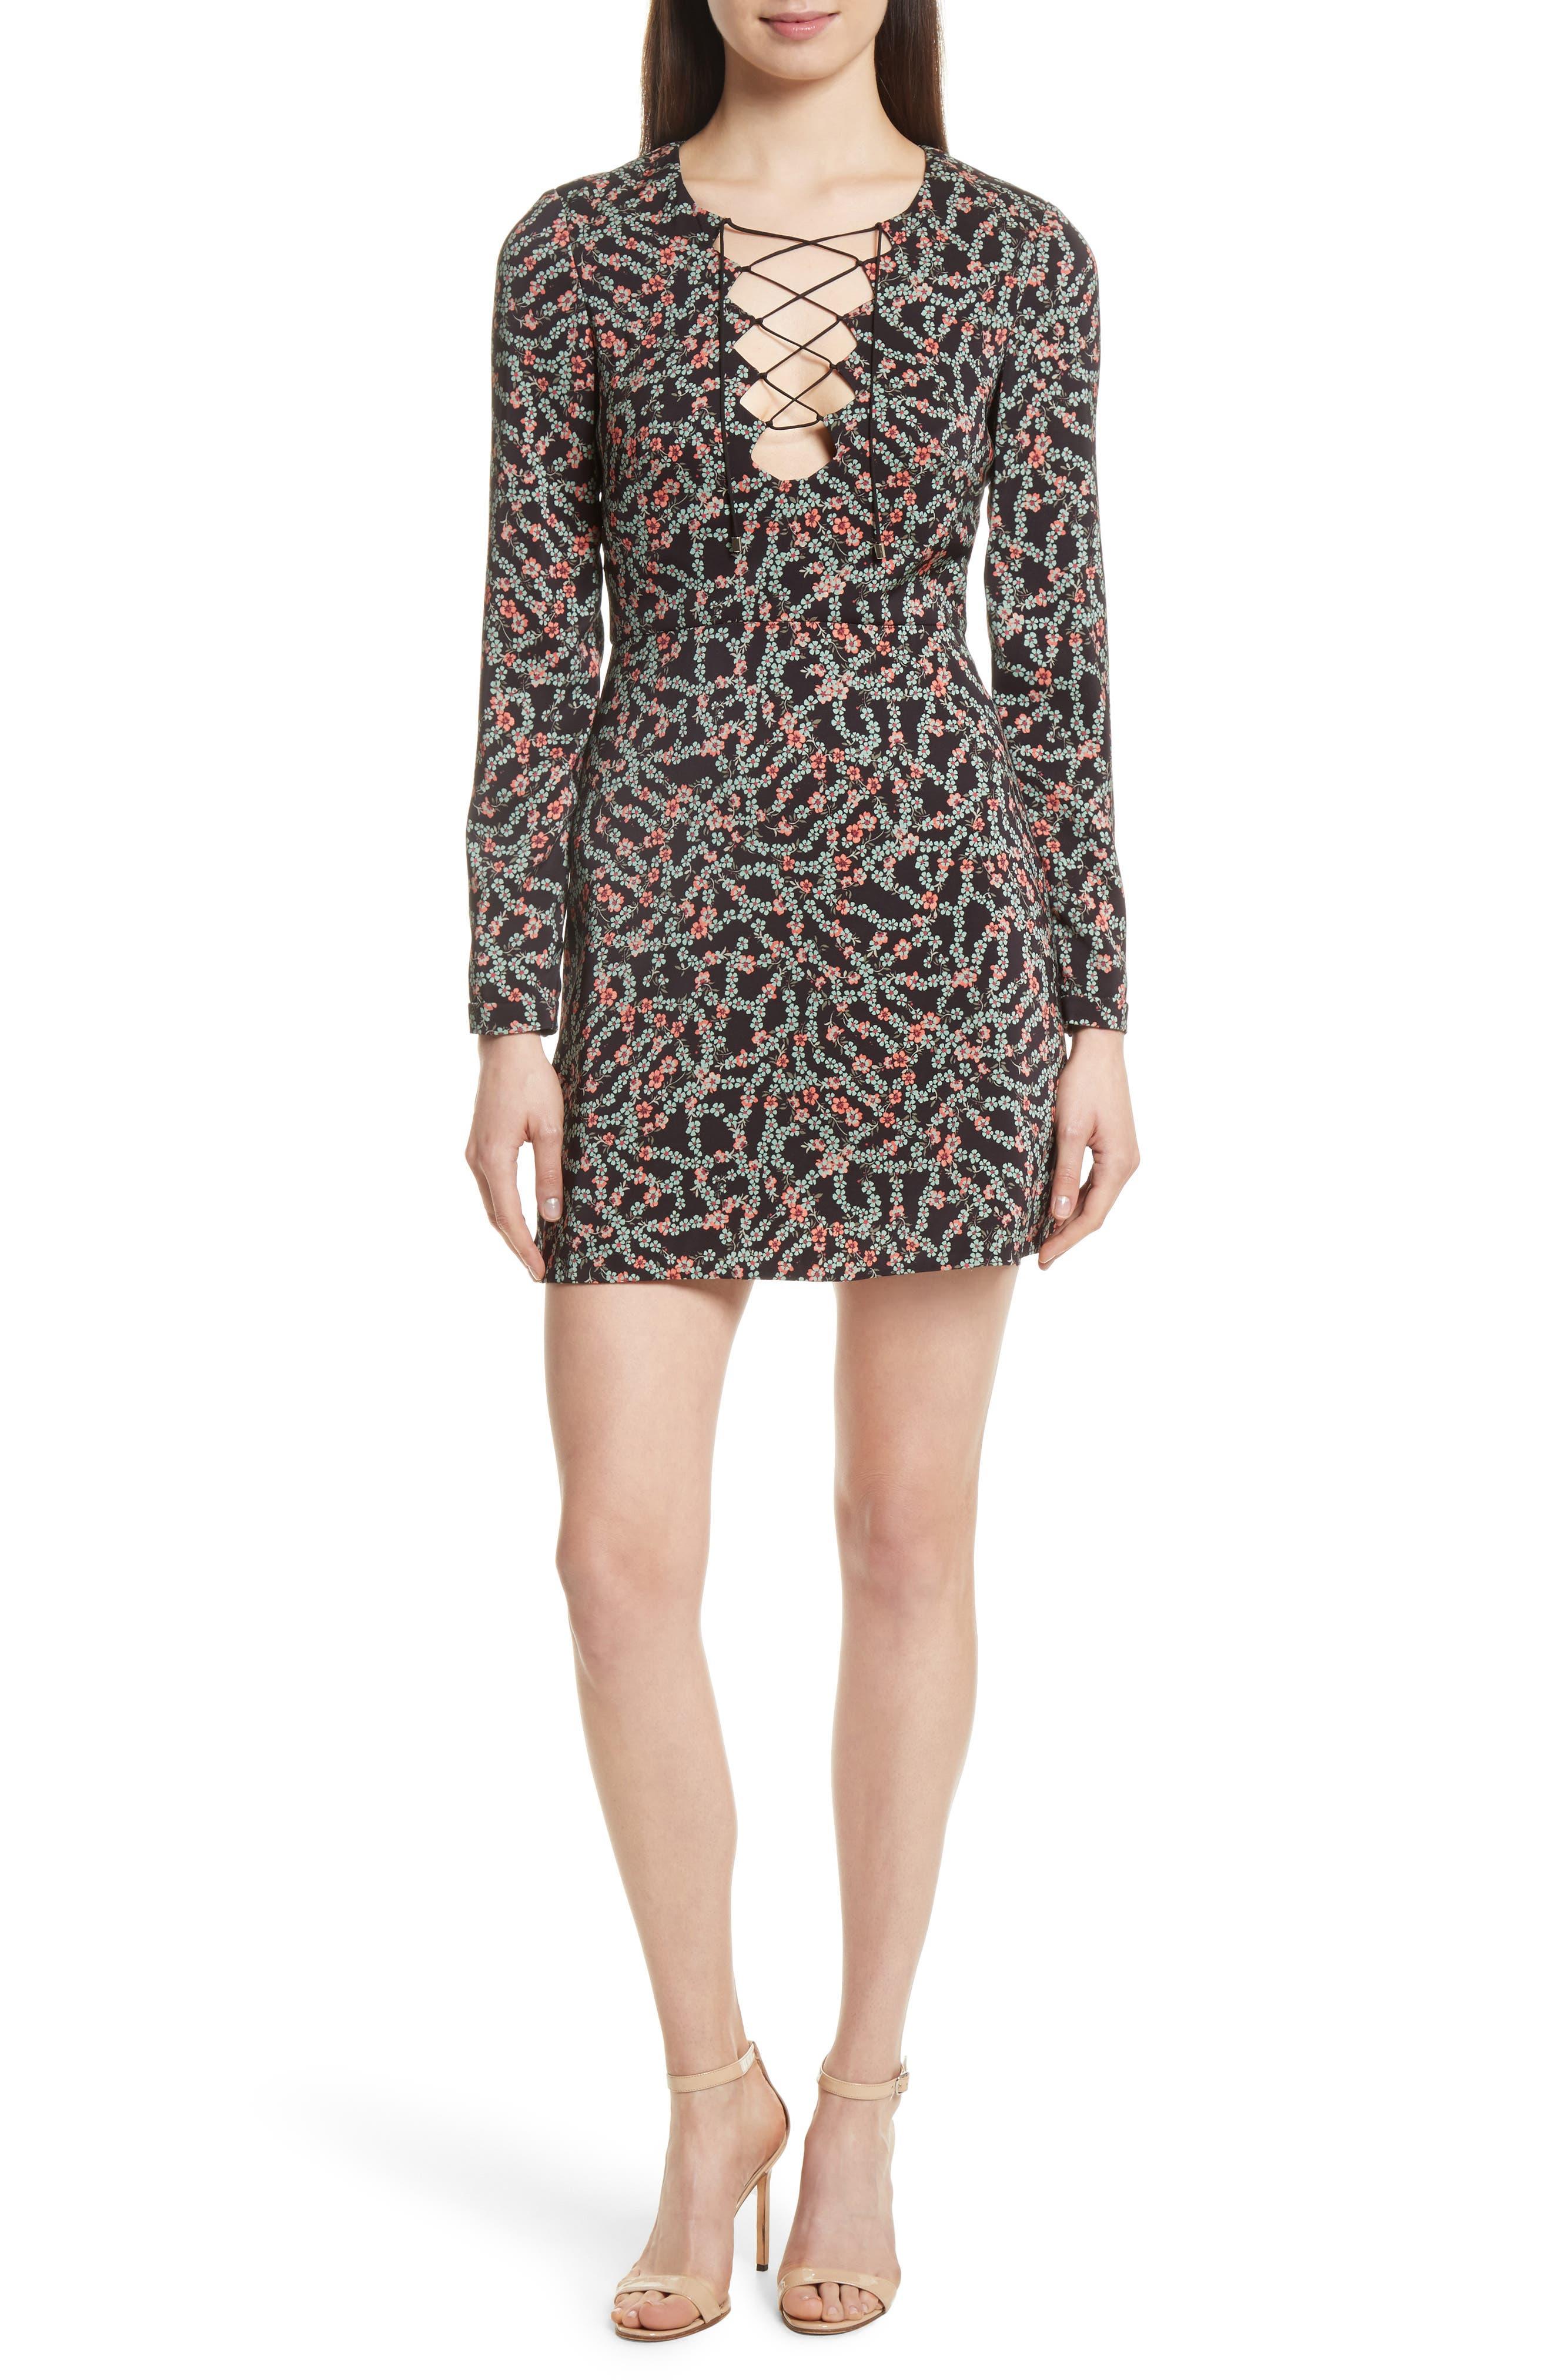 Alternate Image 1 Selected - SALONI Nurul Floral Print Lace-Up Dress